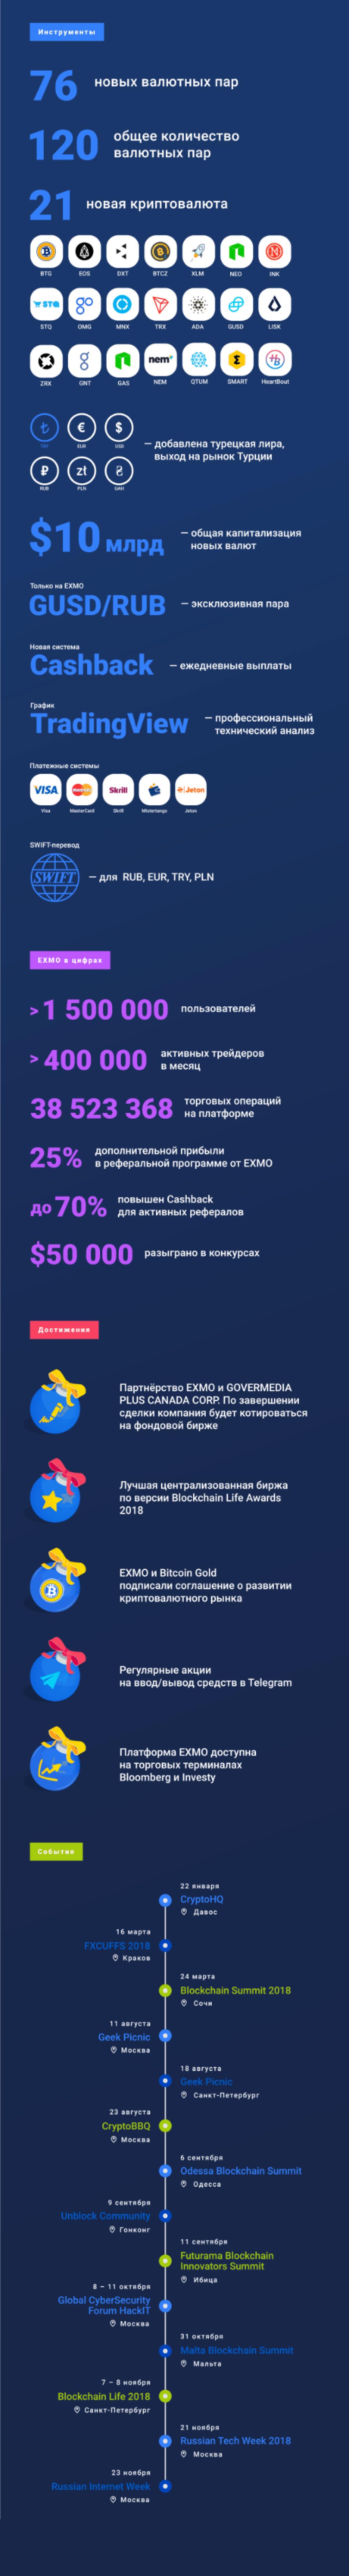 Инфографика: итоги 2018